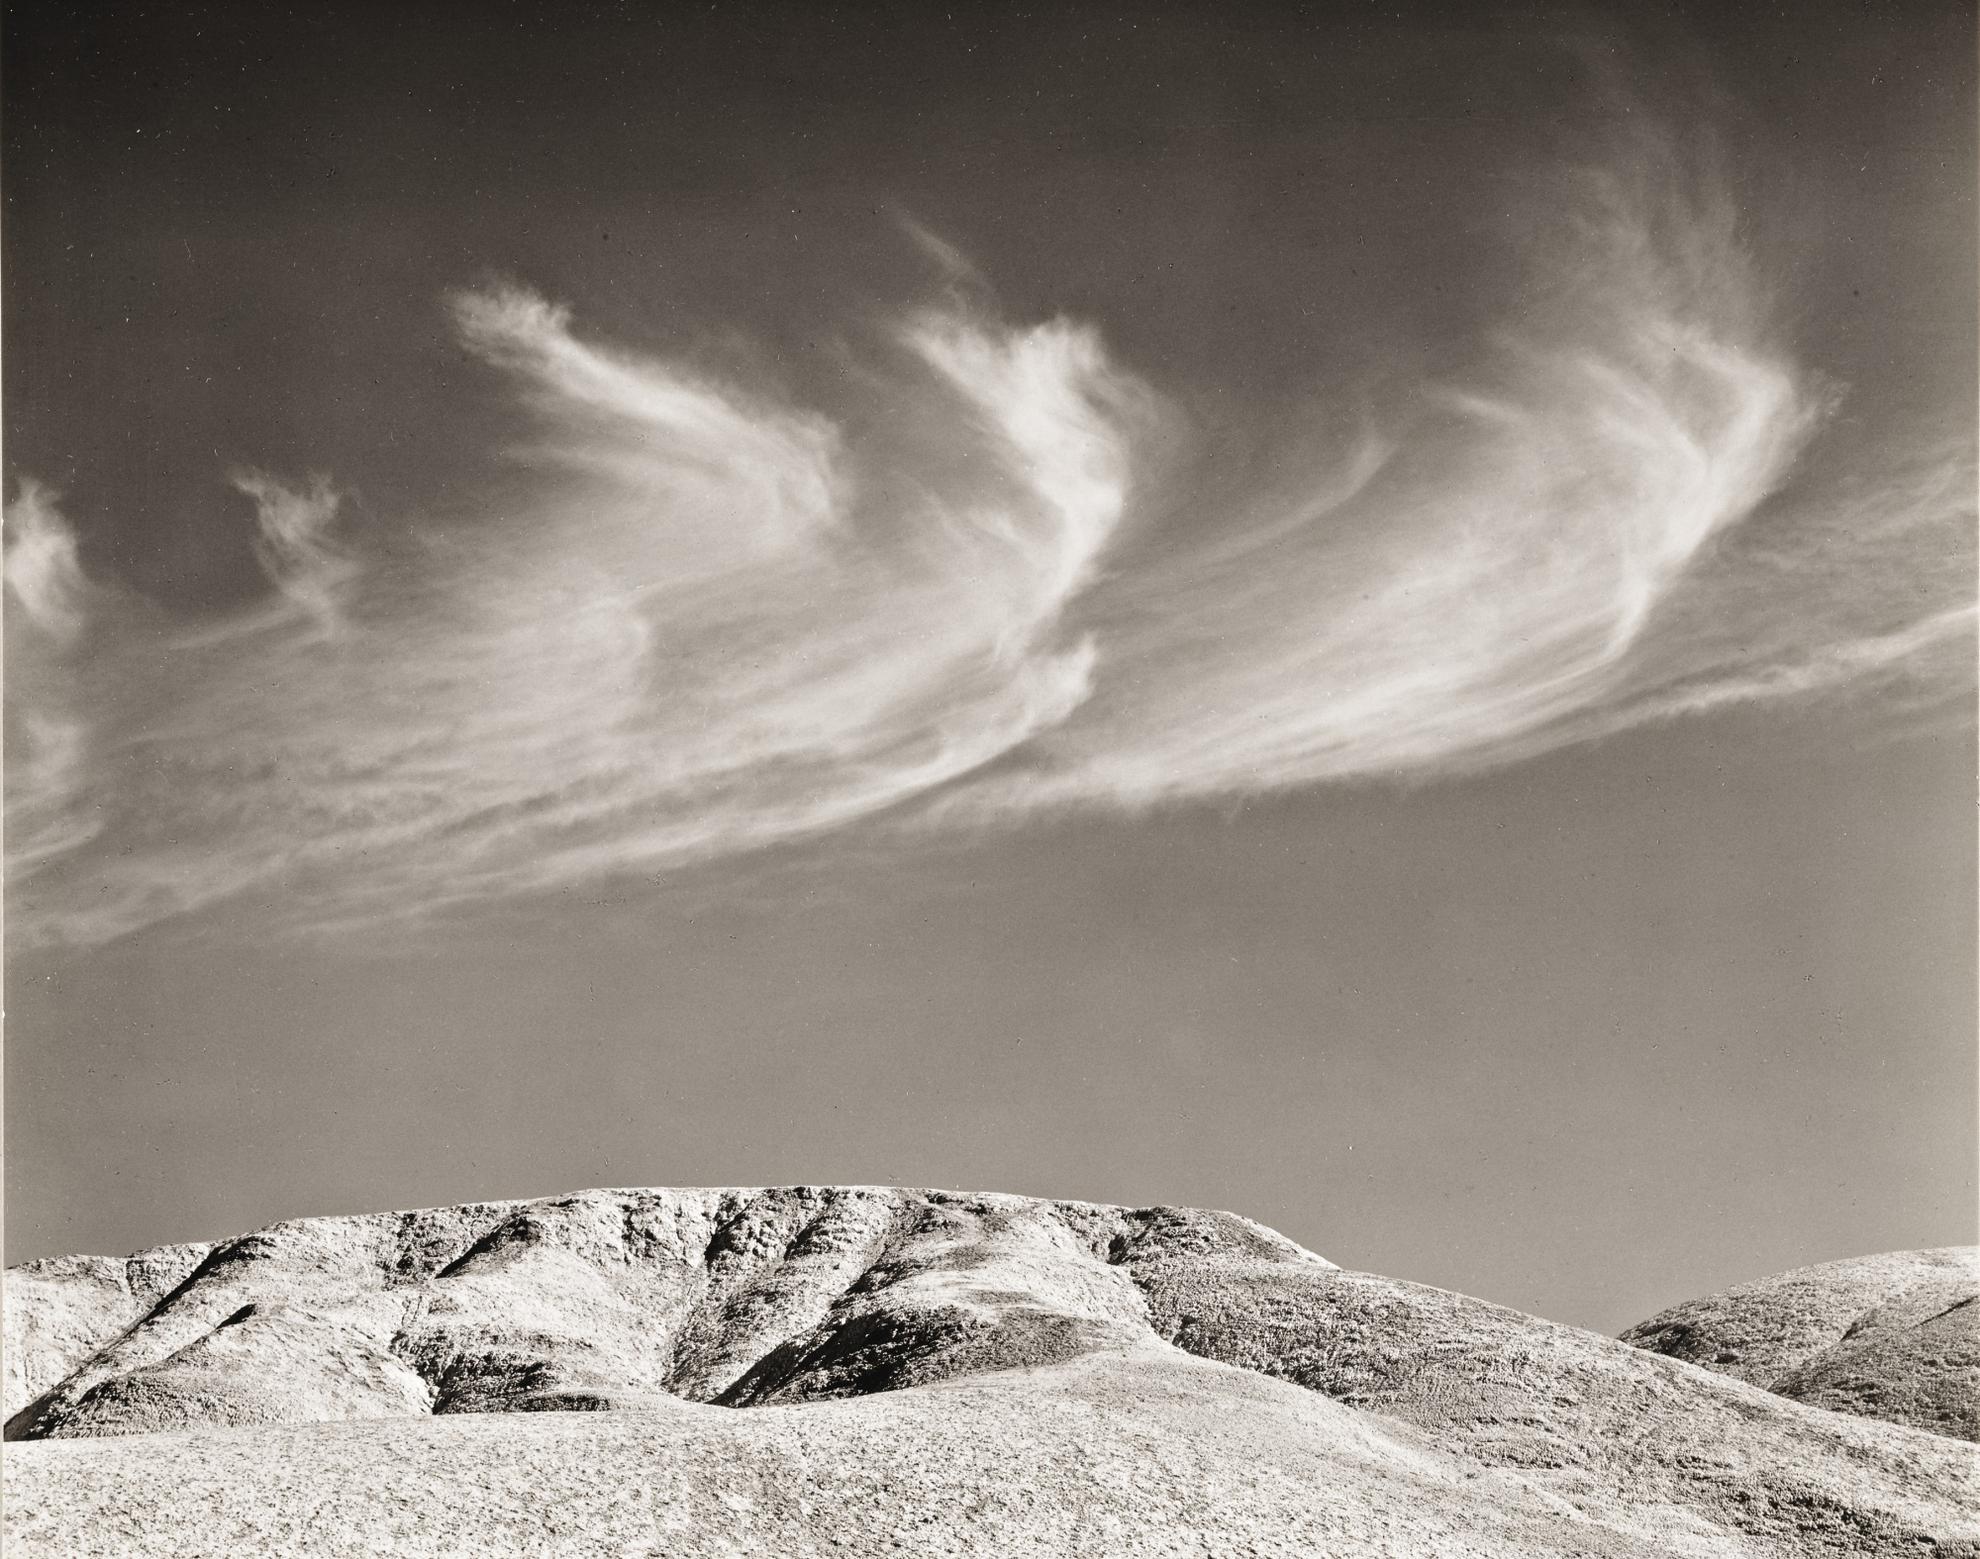 Edward Weston-Texas Springs Death Valley-1938